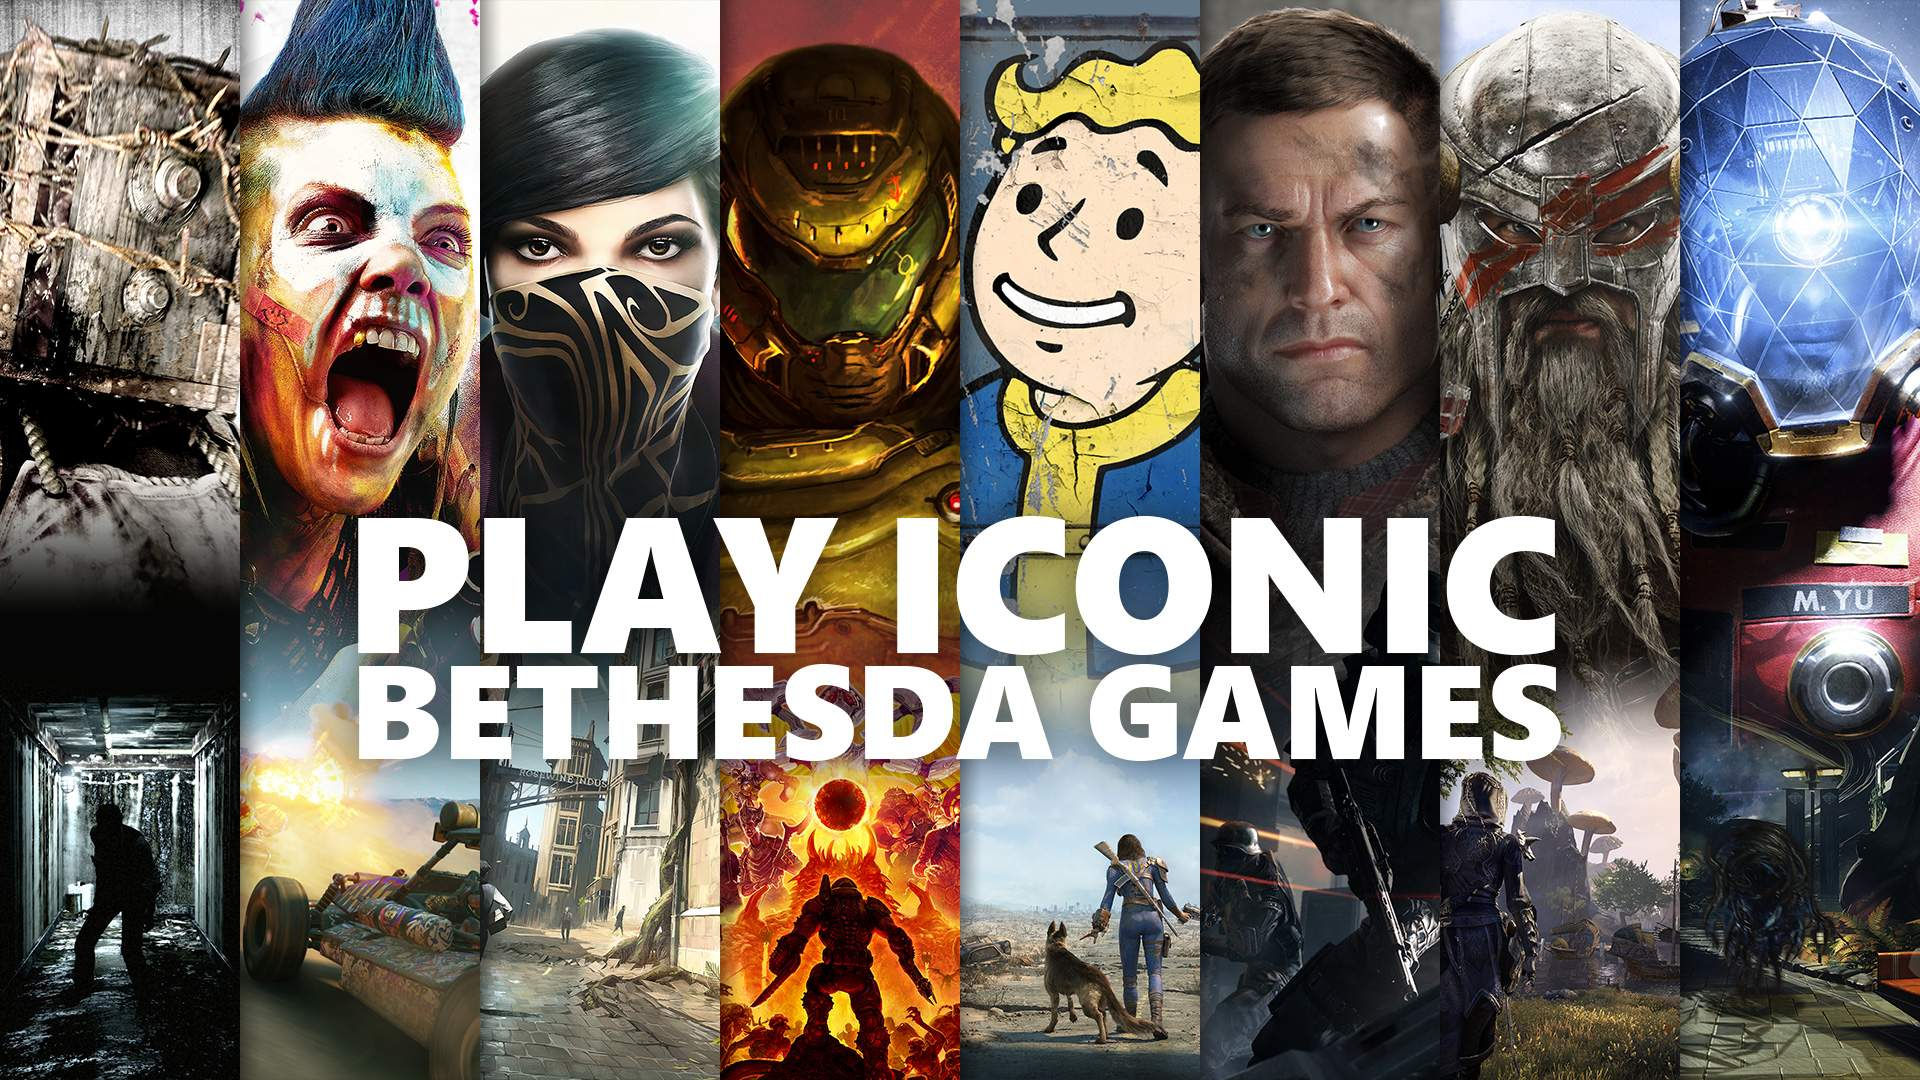 Xbox Game Pass aggiunge 20 titoli di Bethesda